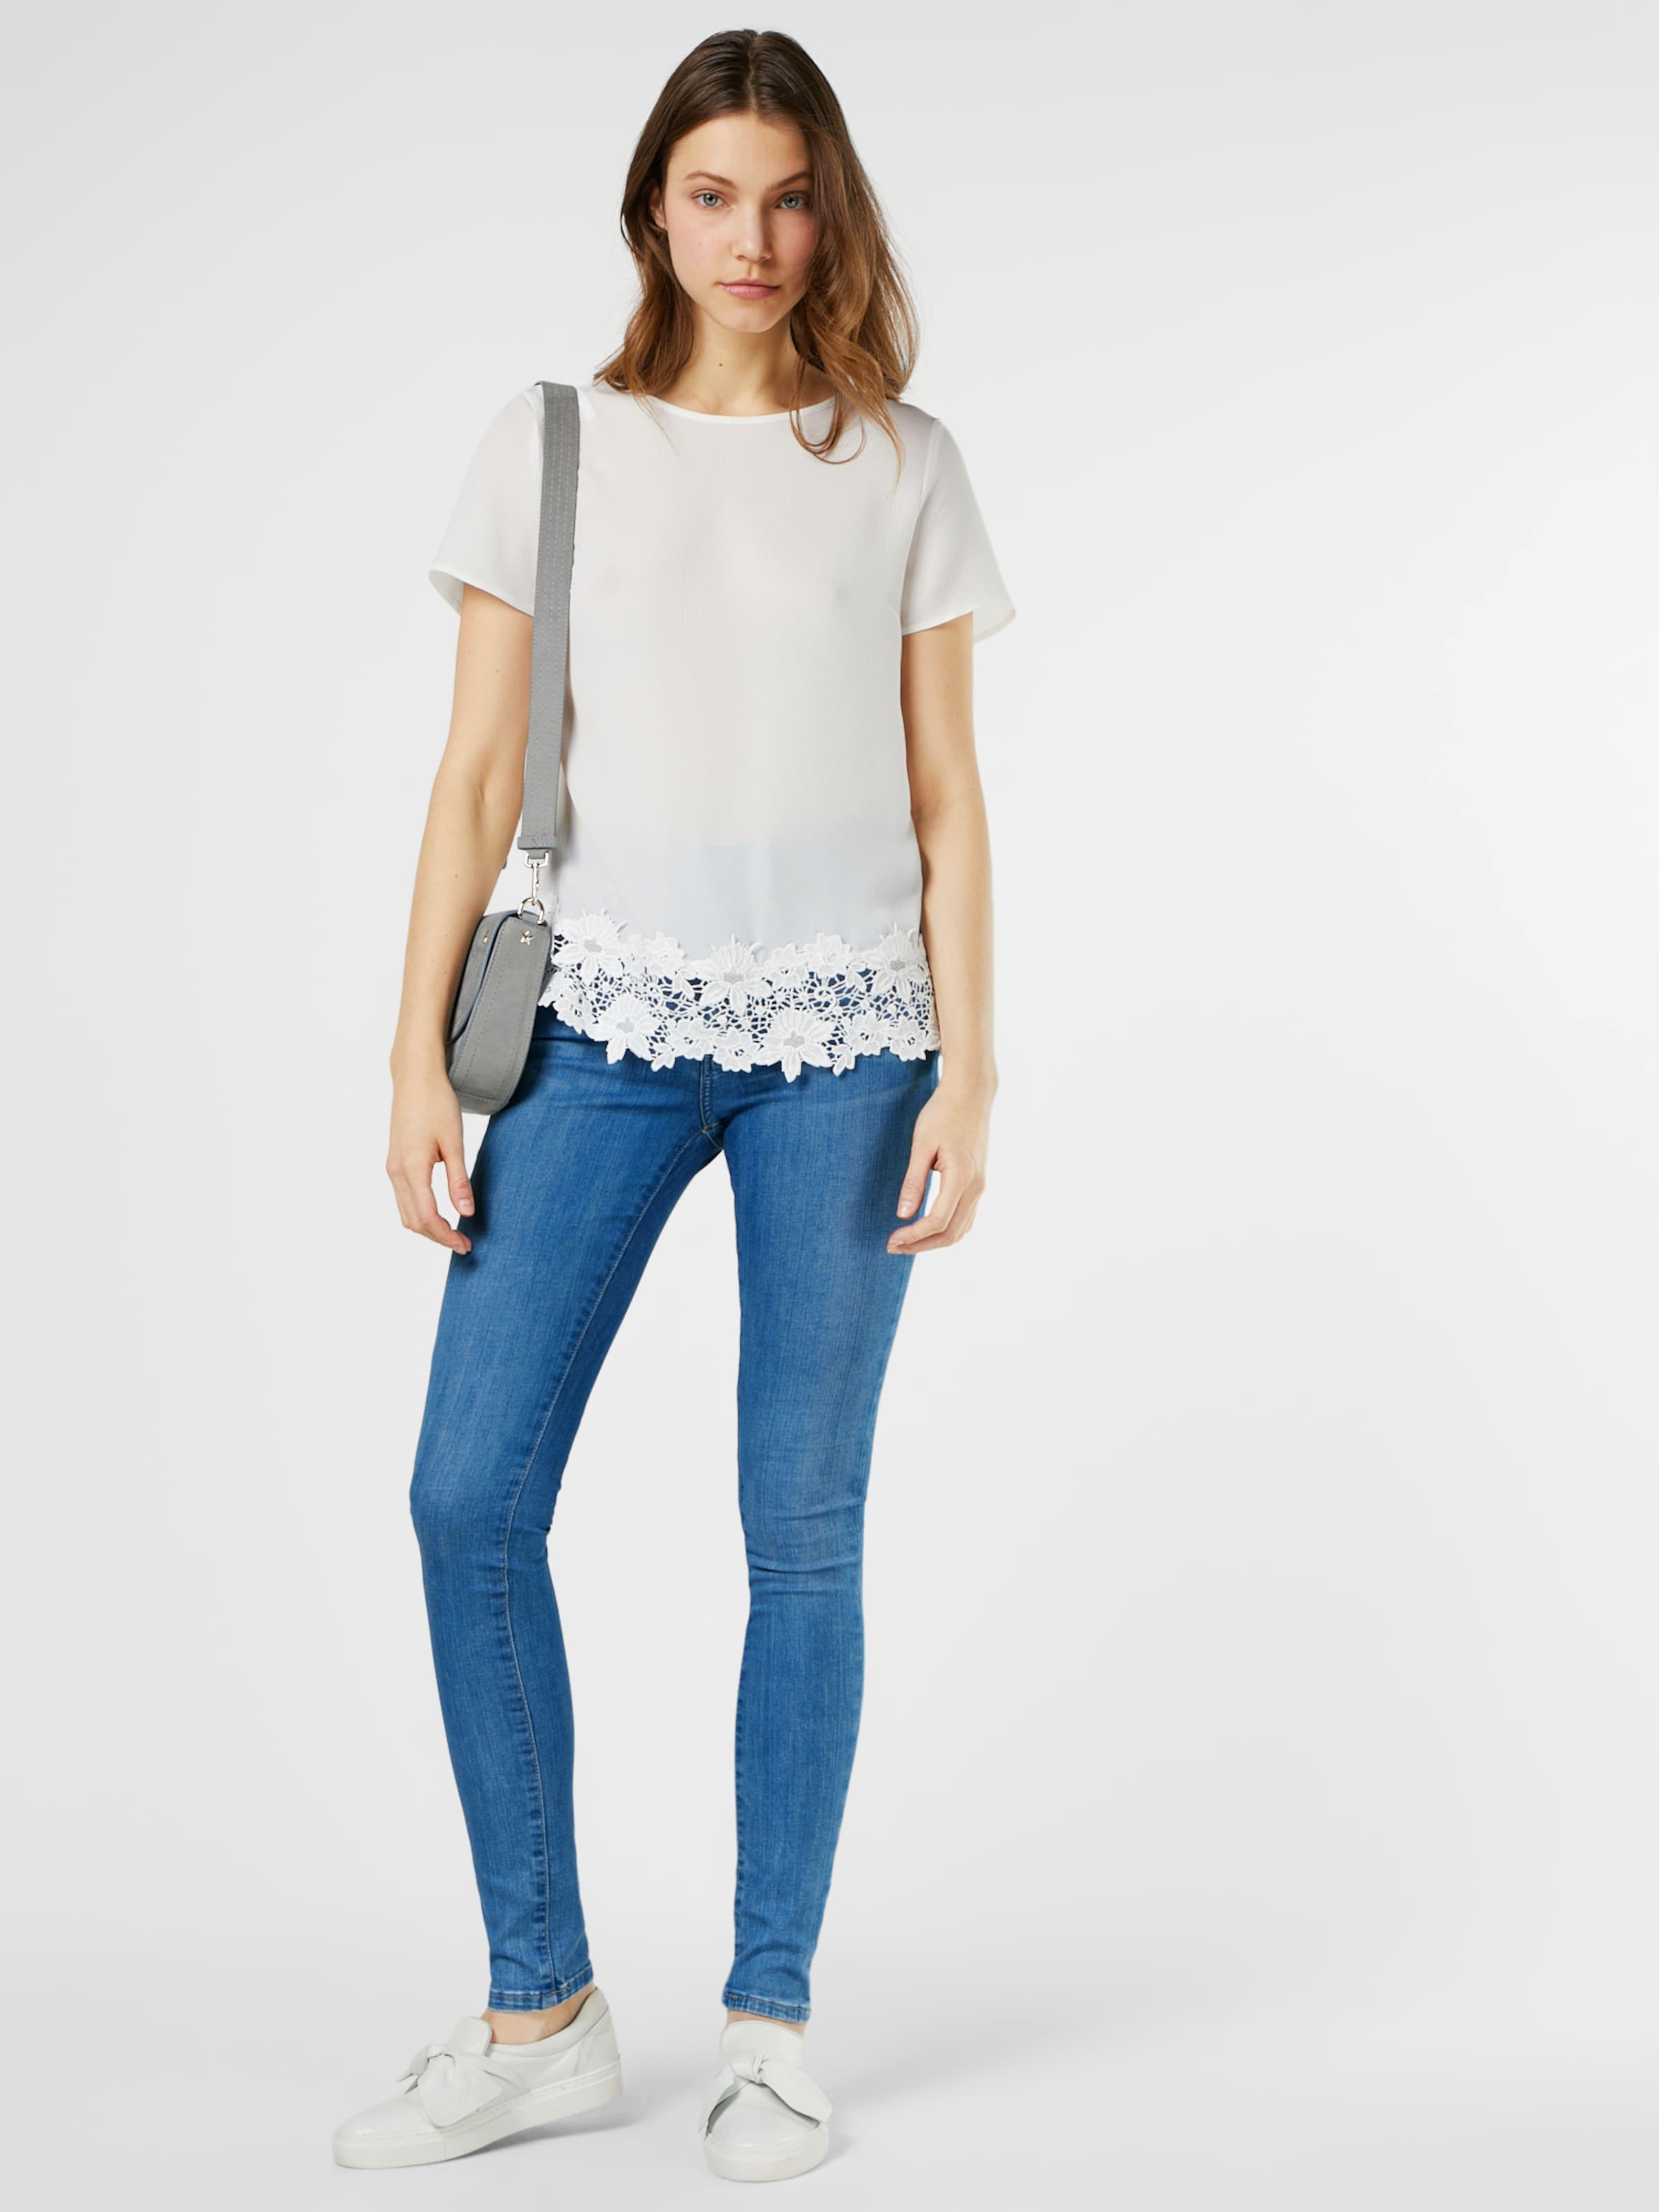 Jeans 'regent' Pepe In Blue Denim vmwON0n8